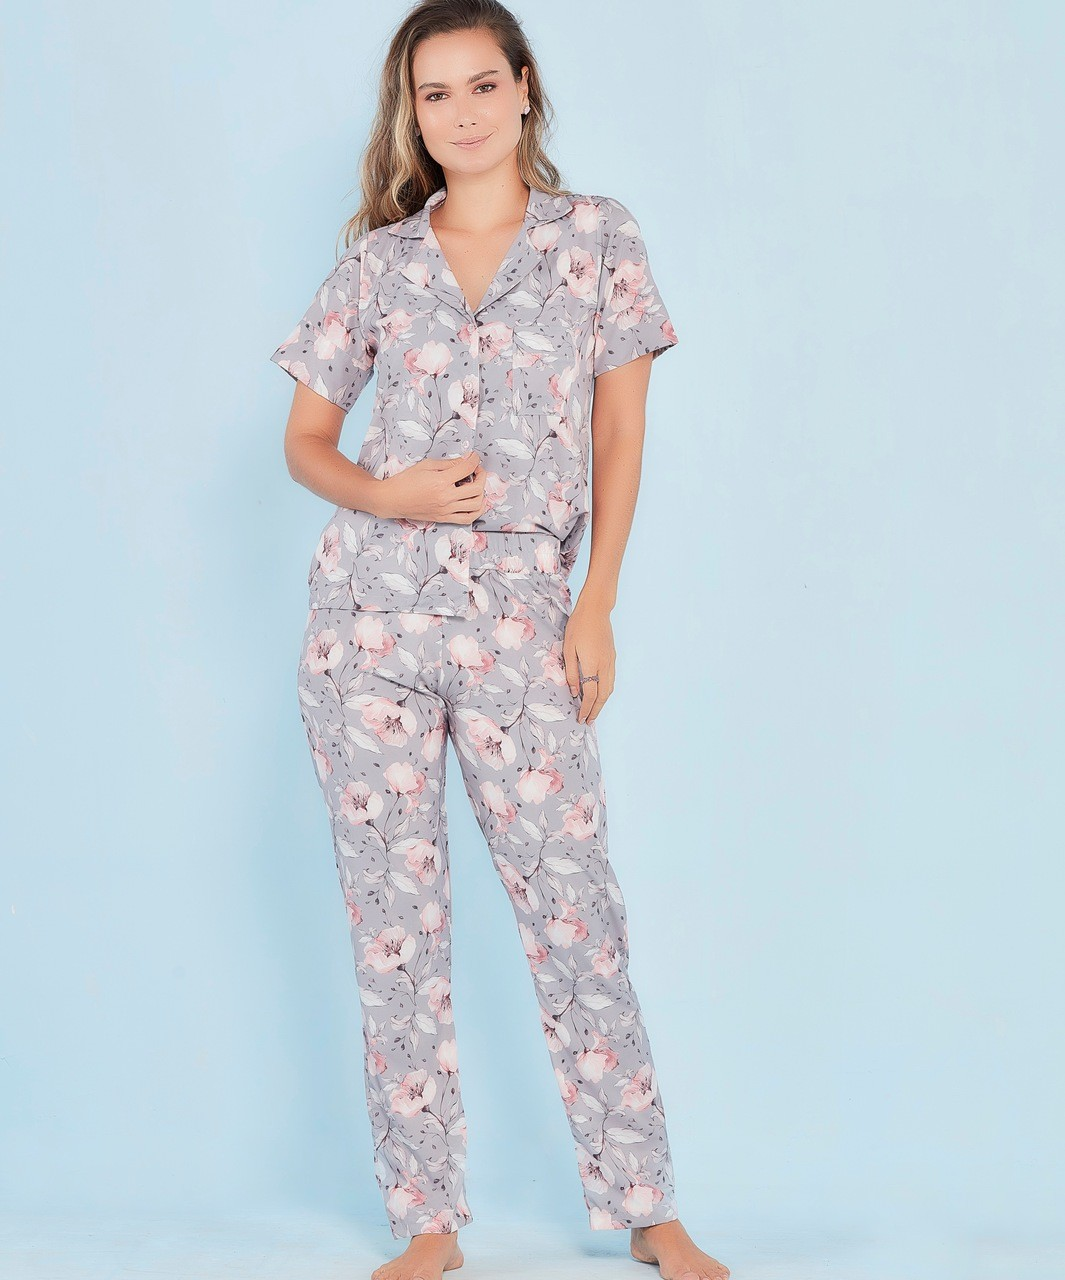 Pijama amamentação estampa floral cinza